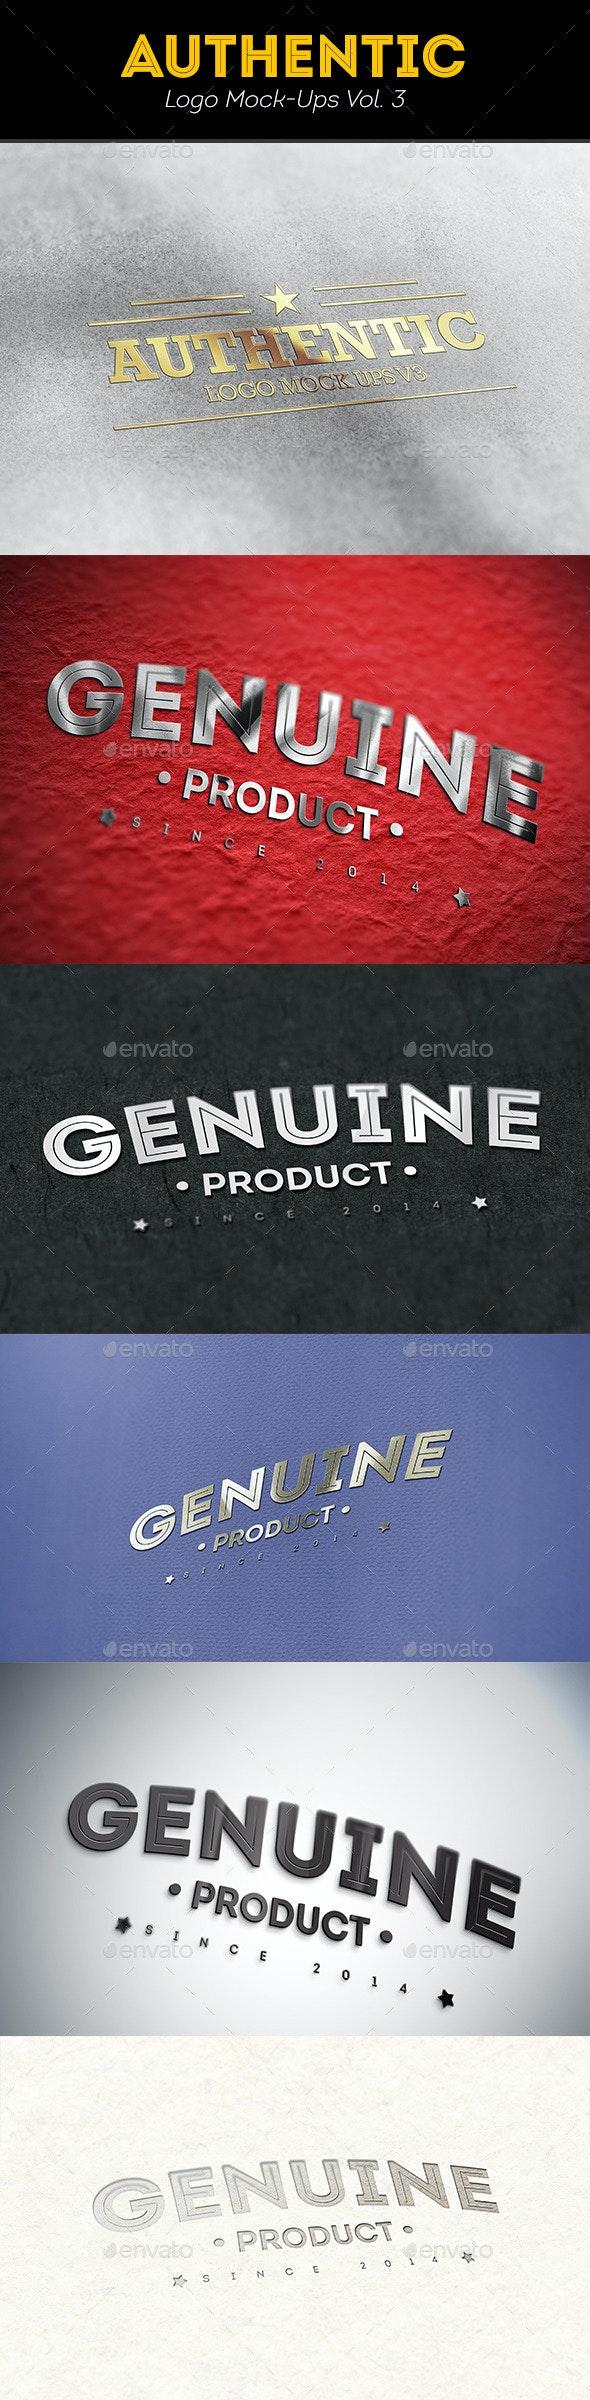 Authentic Logo Mockups Vol. 3 - Logo Product Mock-Ups